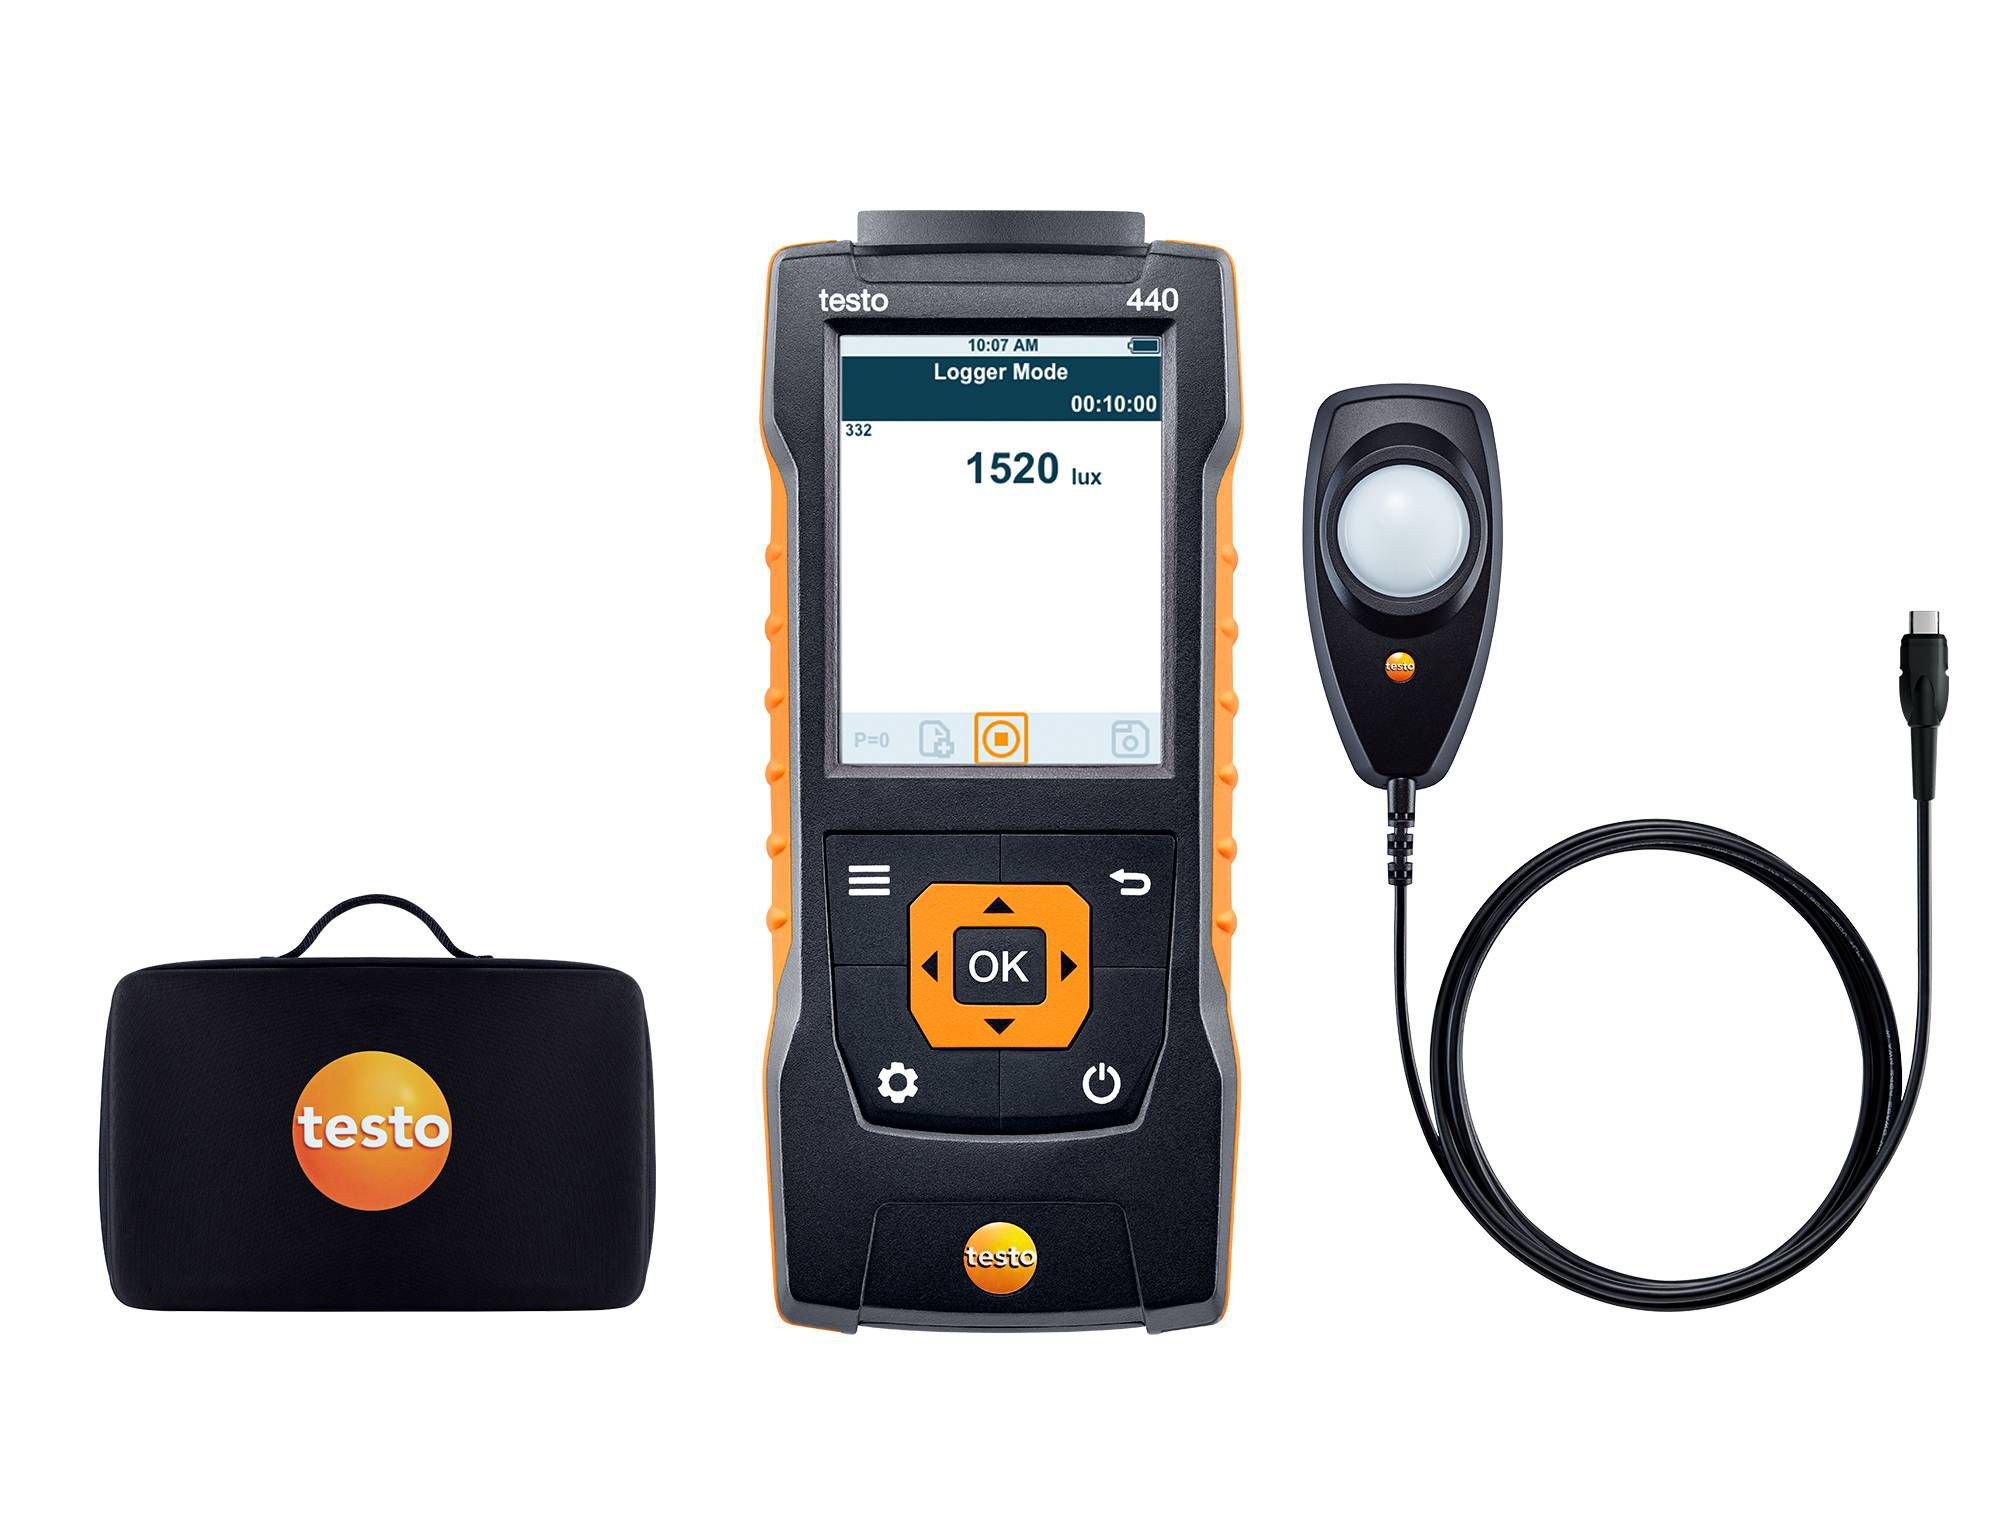 testo440 Kit lux